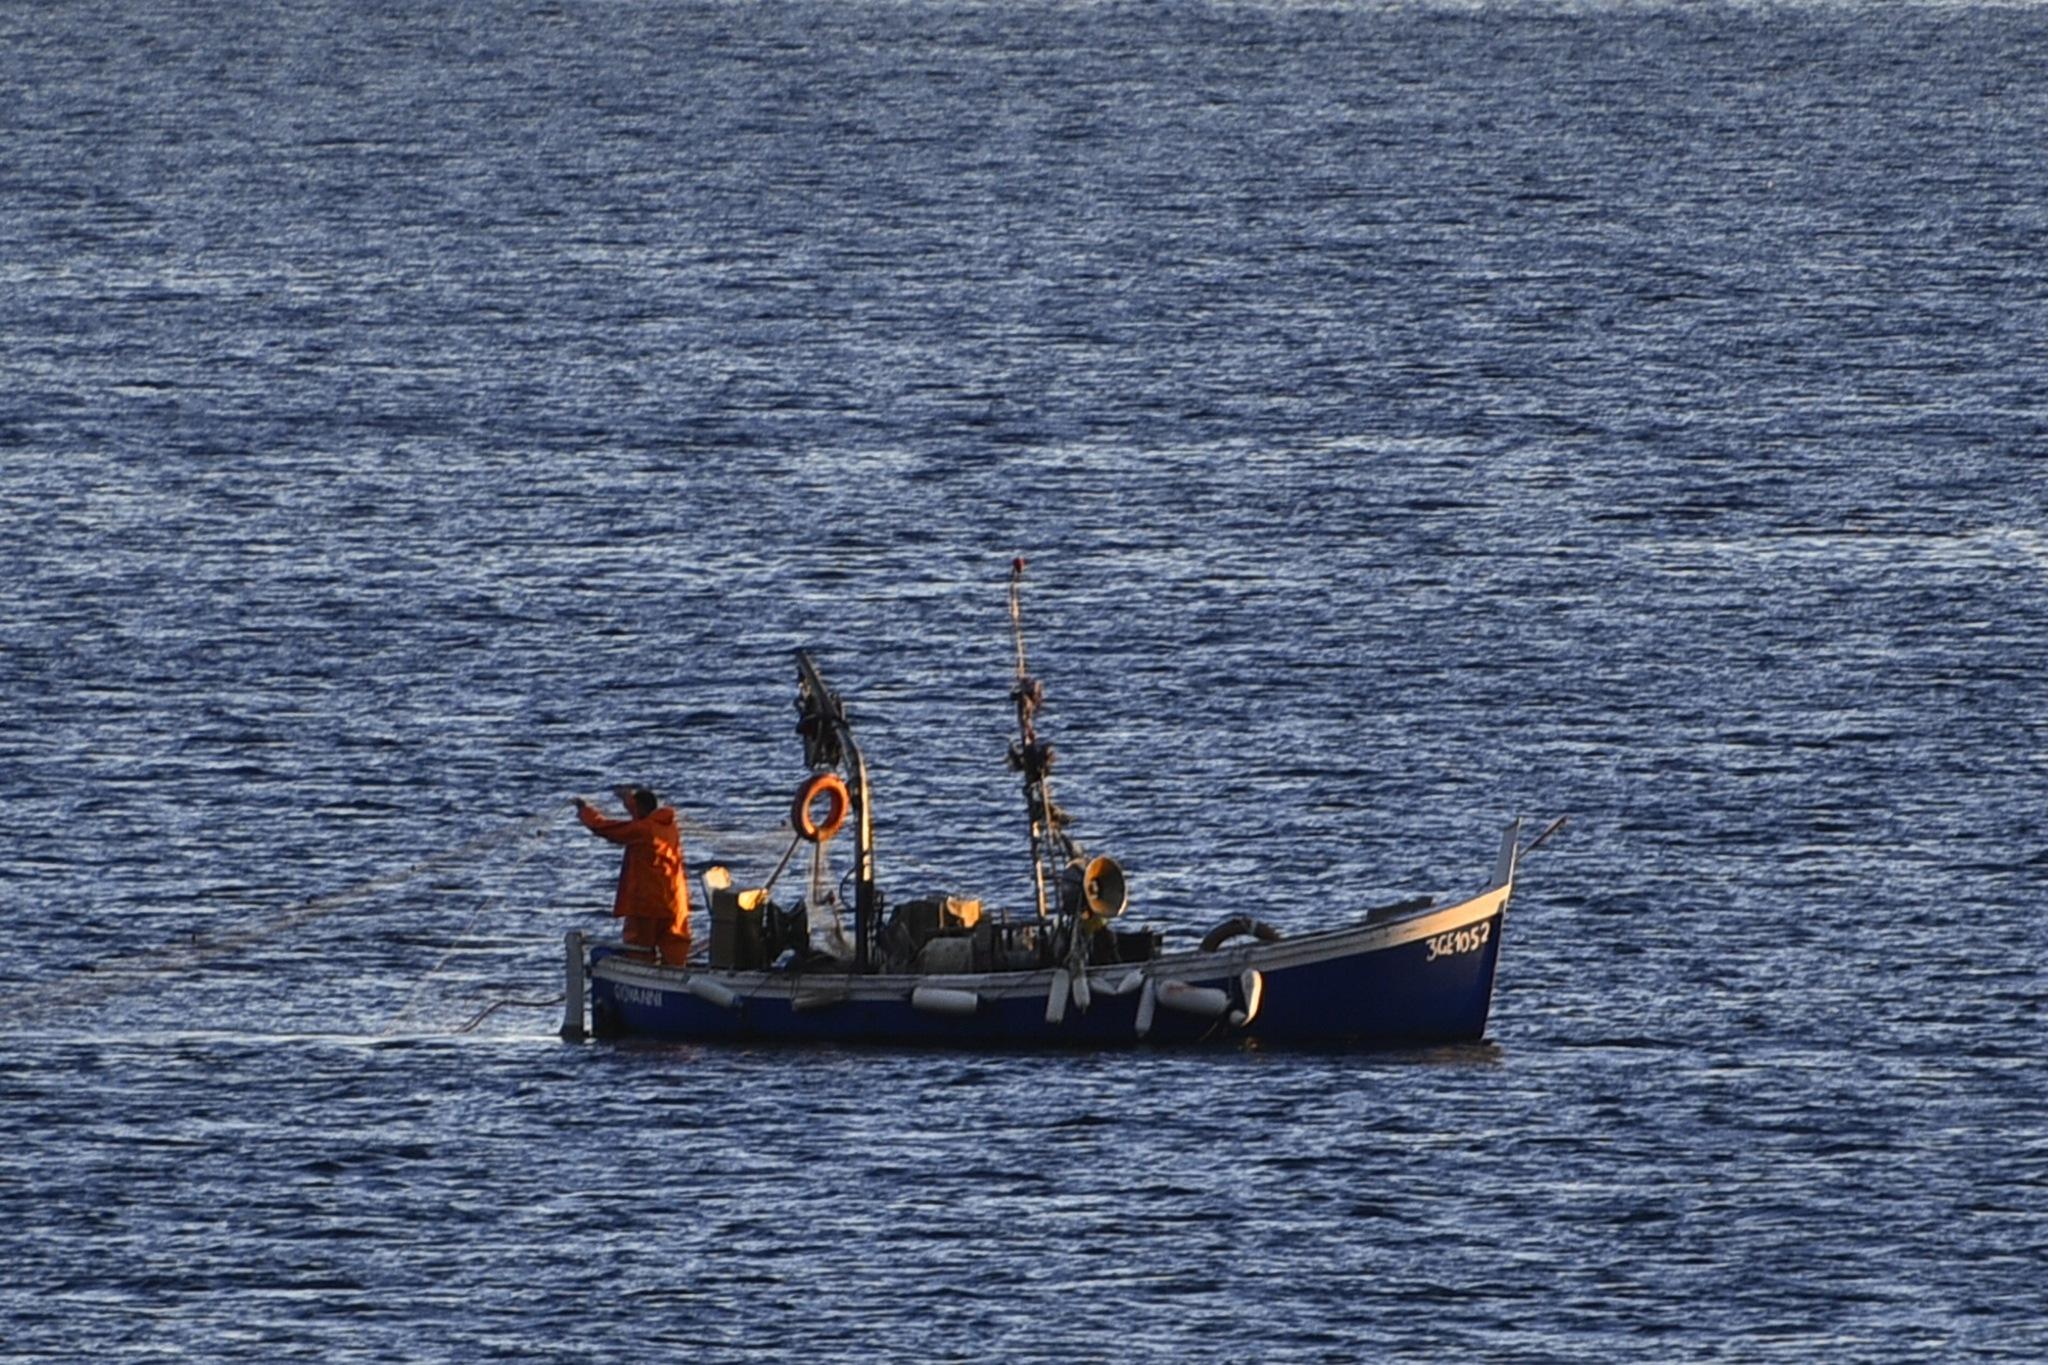 Ligurian fisherman by sunrisesunset